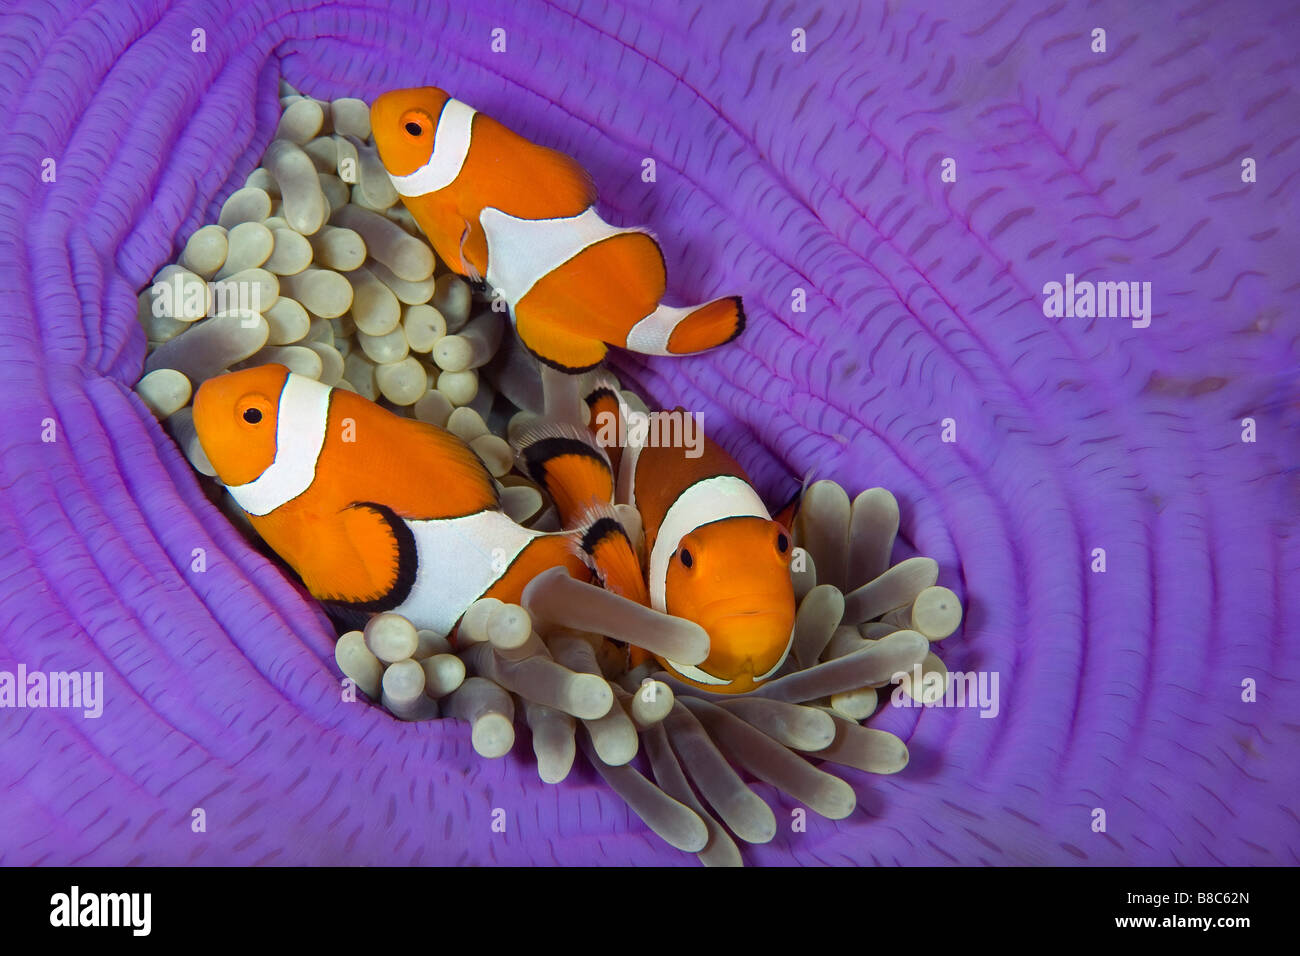 False clownfish - Stock Image